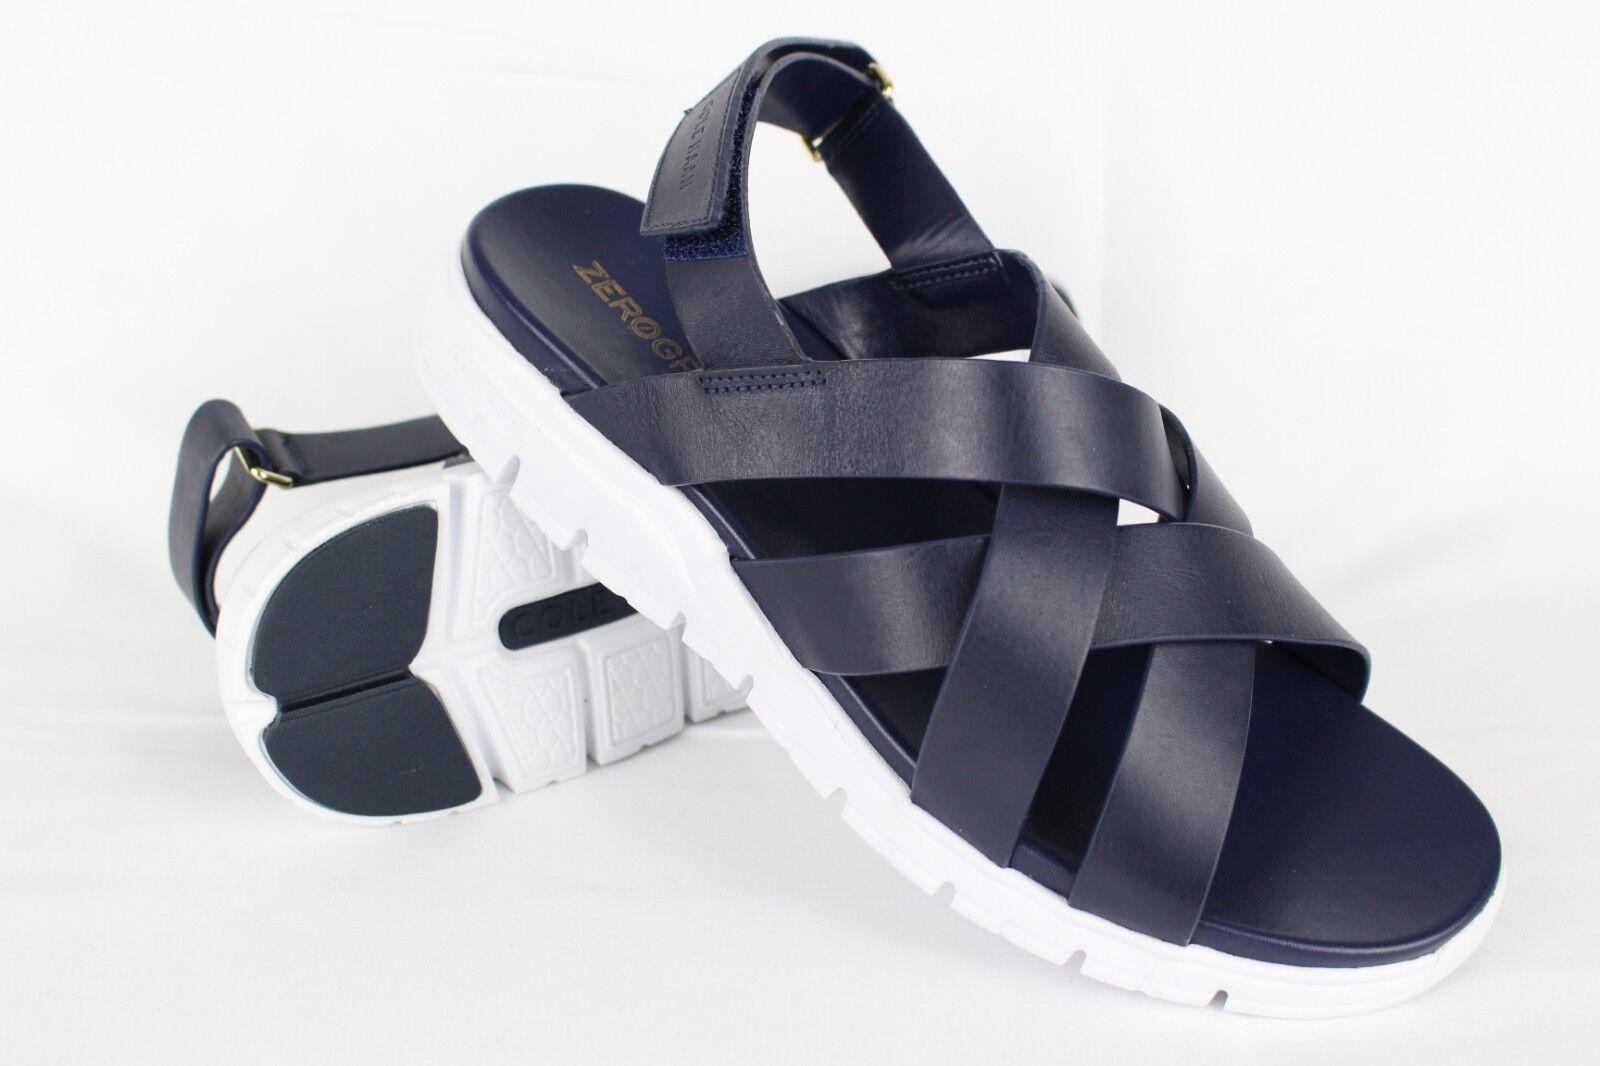 Cole Haan para para para mujer cero Grand Criss Cross Sandalias 8.5B Azul Marino blancoo   W07738  ofreciendo 100%